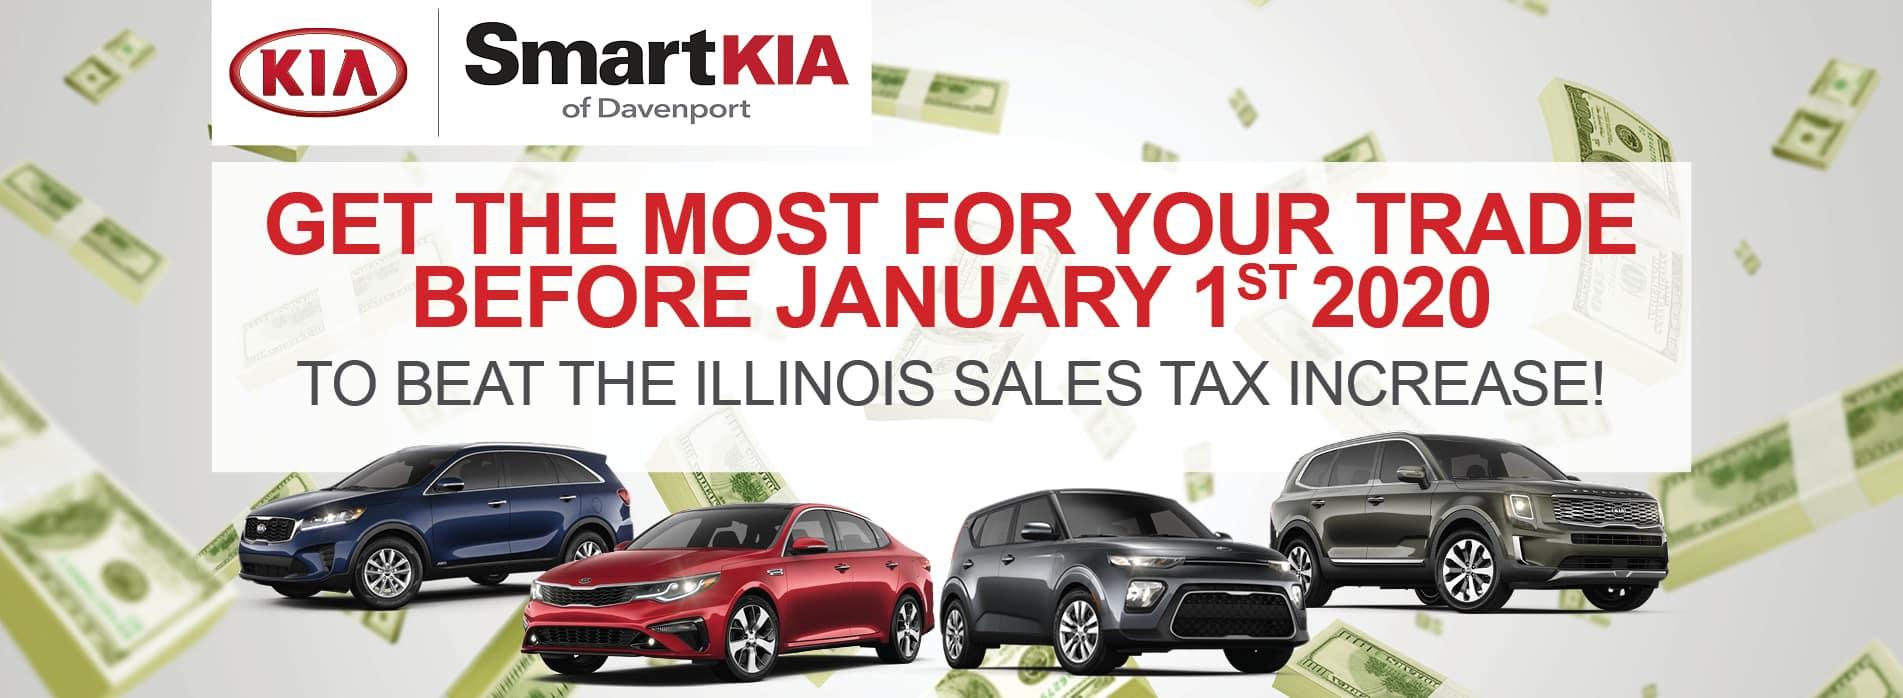 Cars For Sale Quad Cities >> Smart Kia Of Davenport Kia Dealer In Iowa